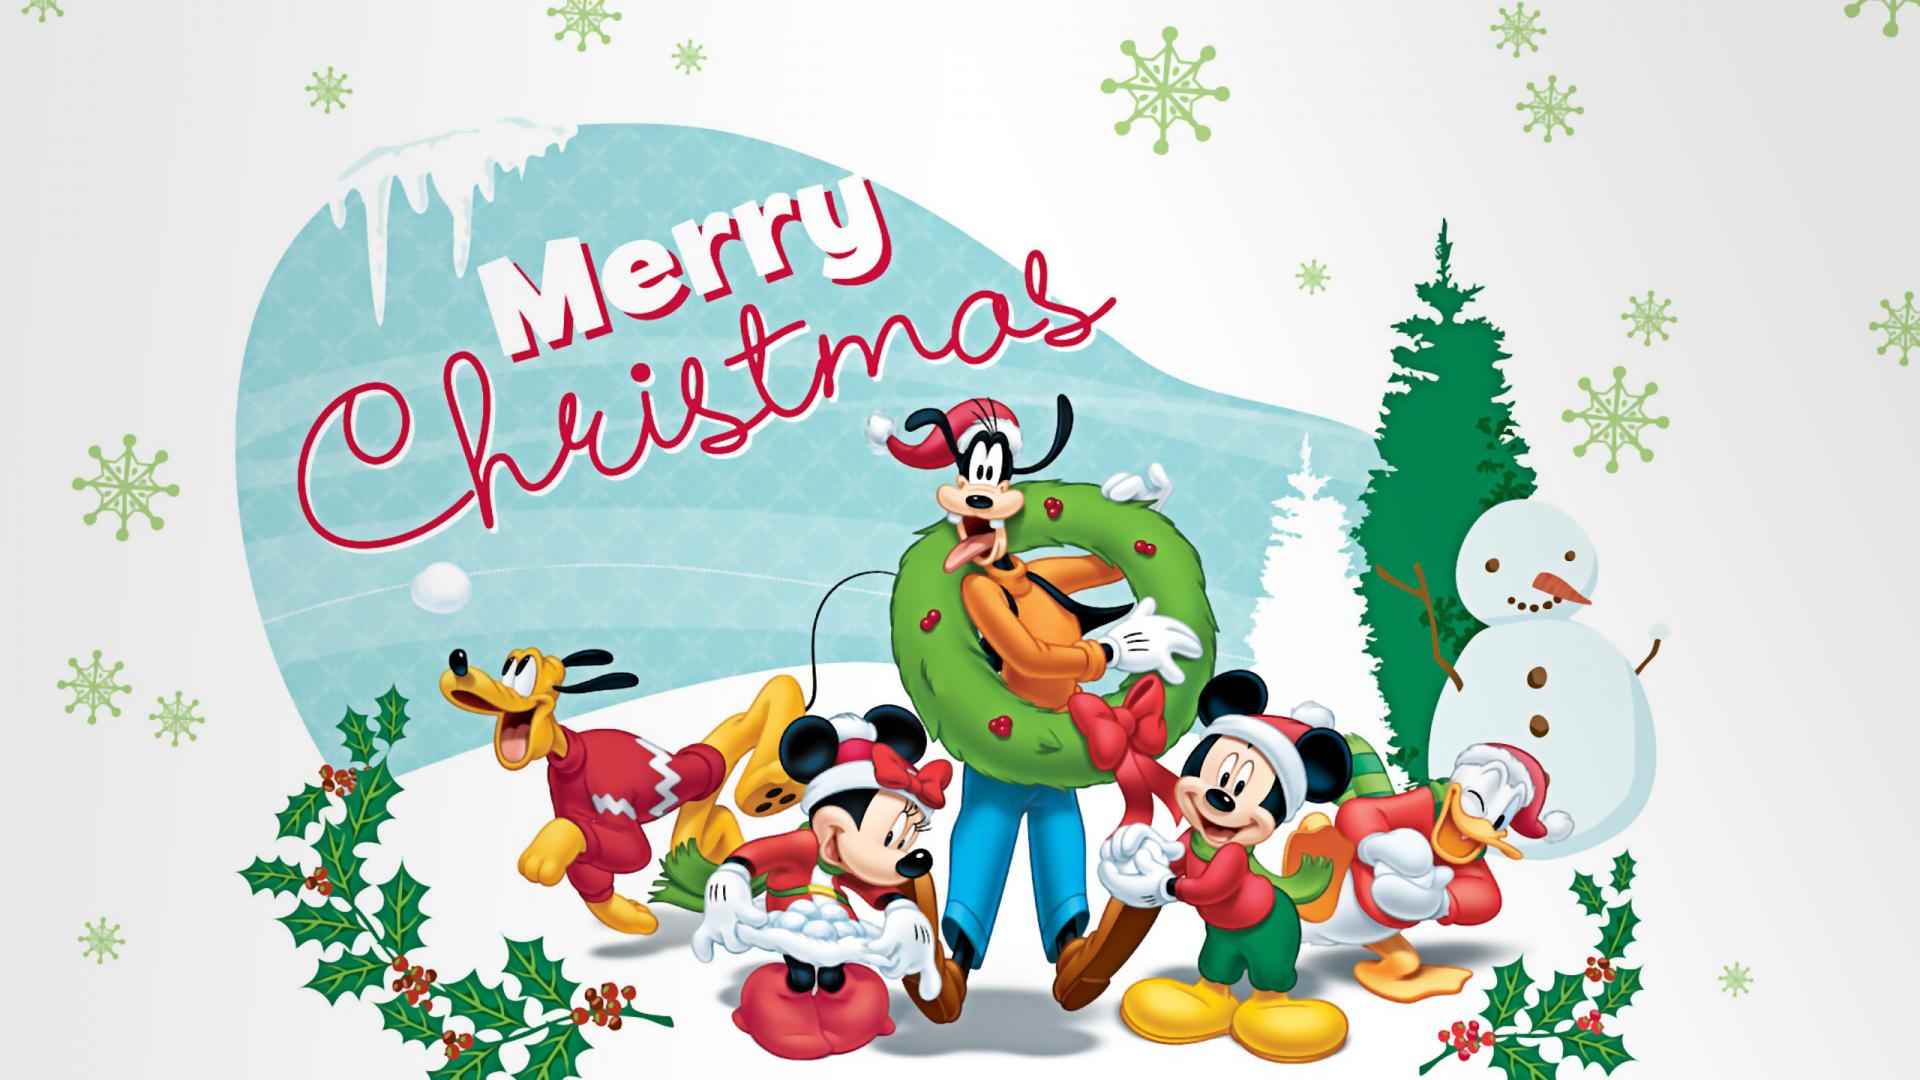 disney desktop christmas wallpaper   wwwwallpapers in hdcom 1920x1080